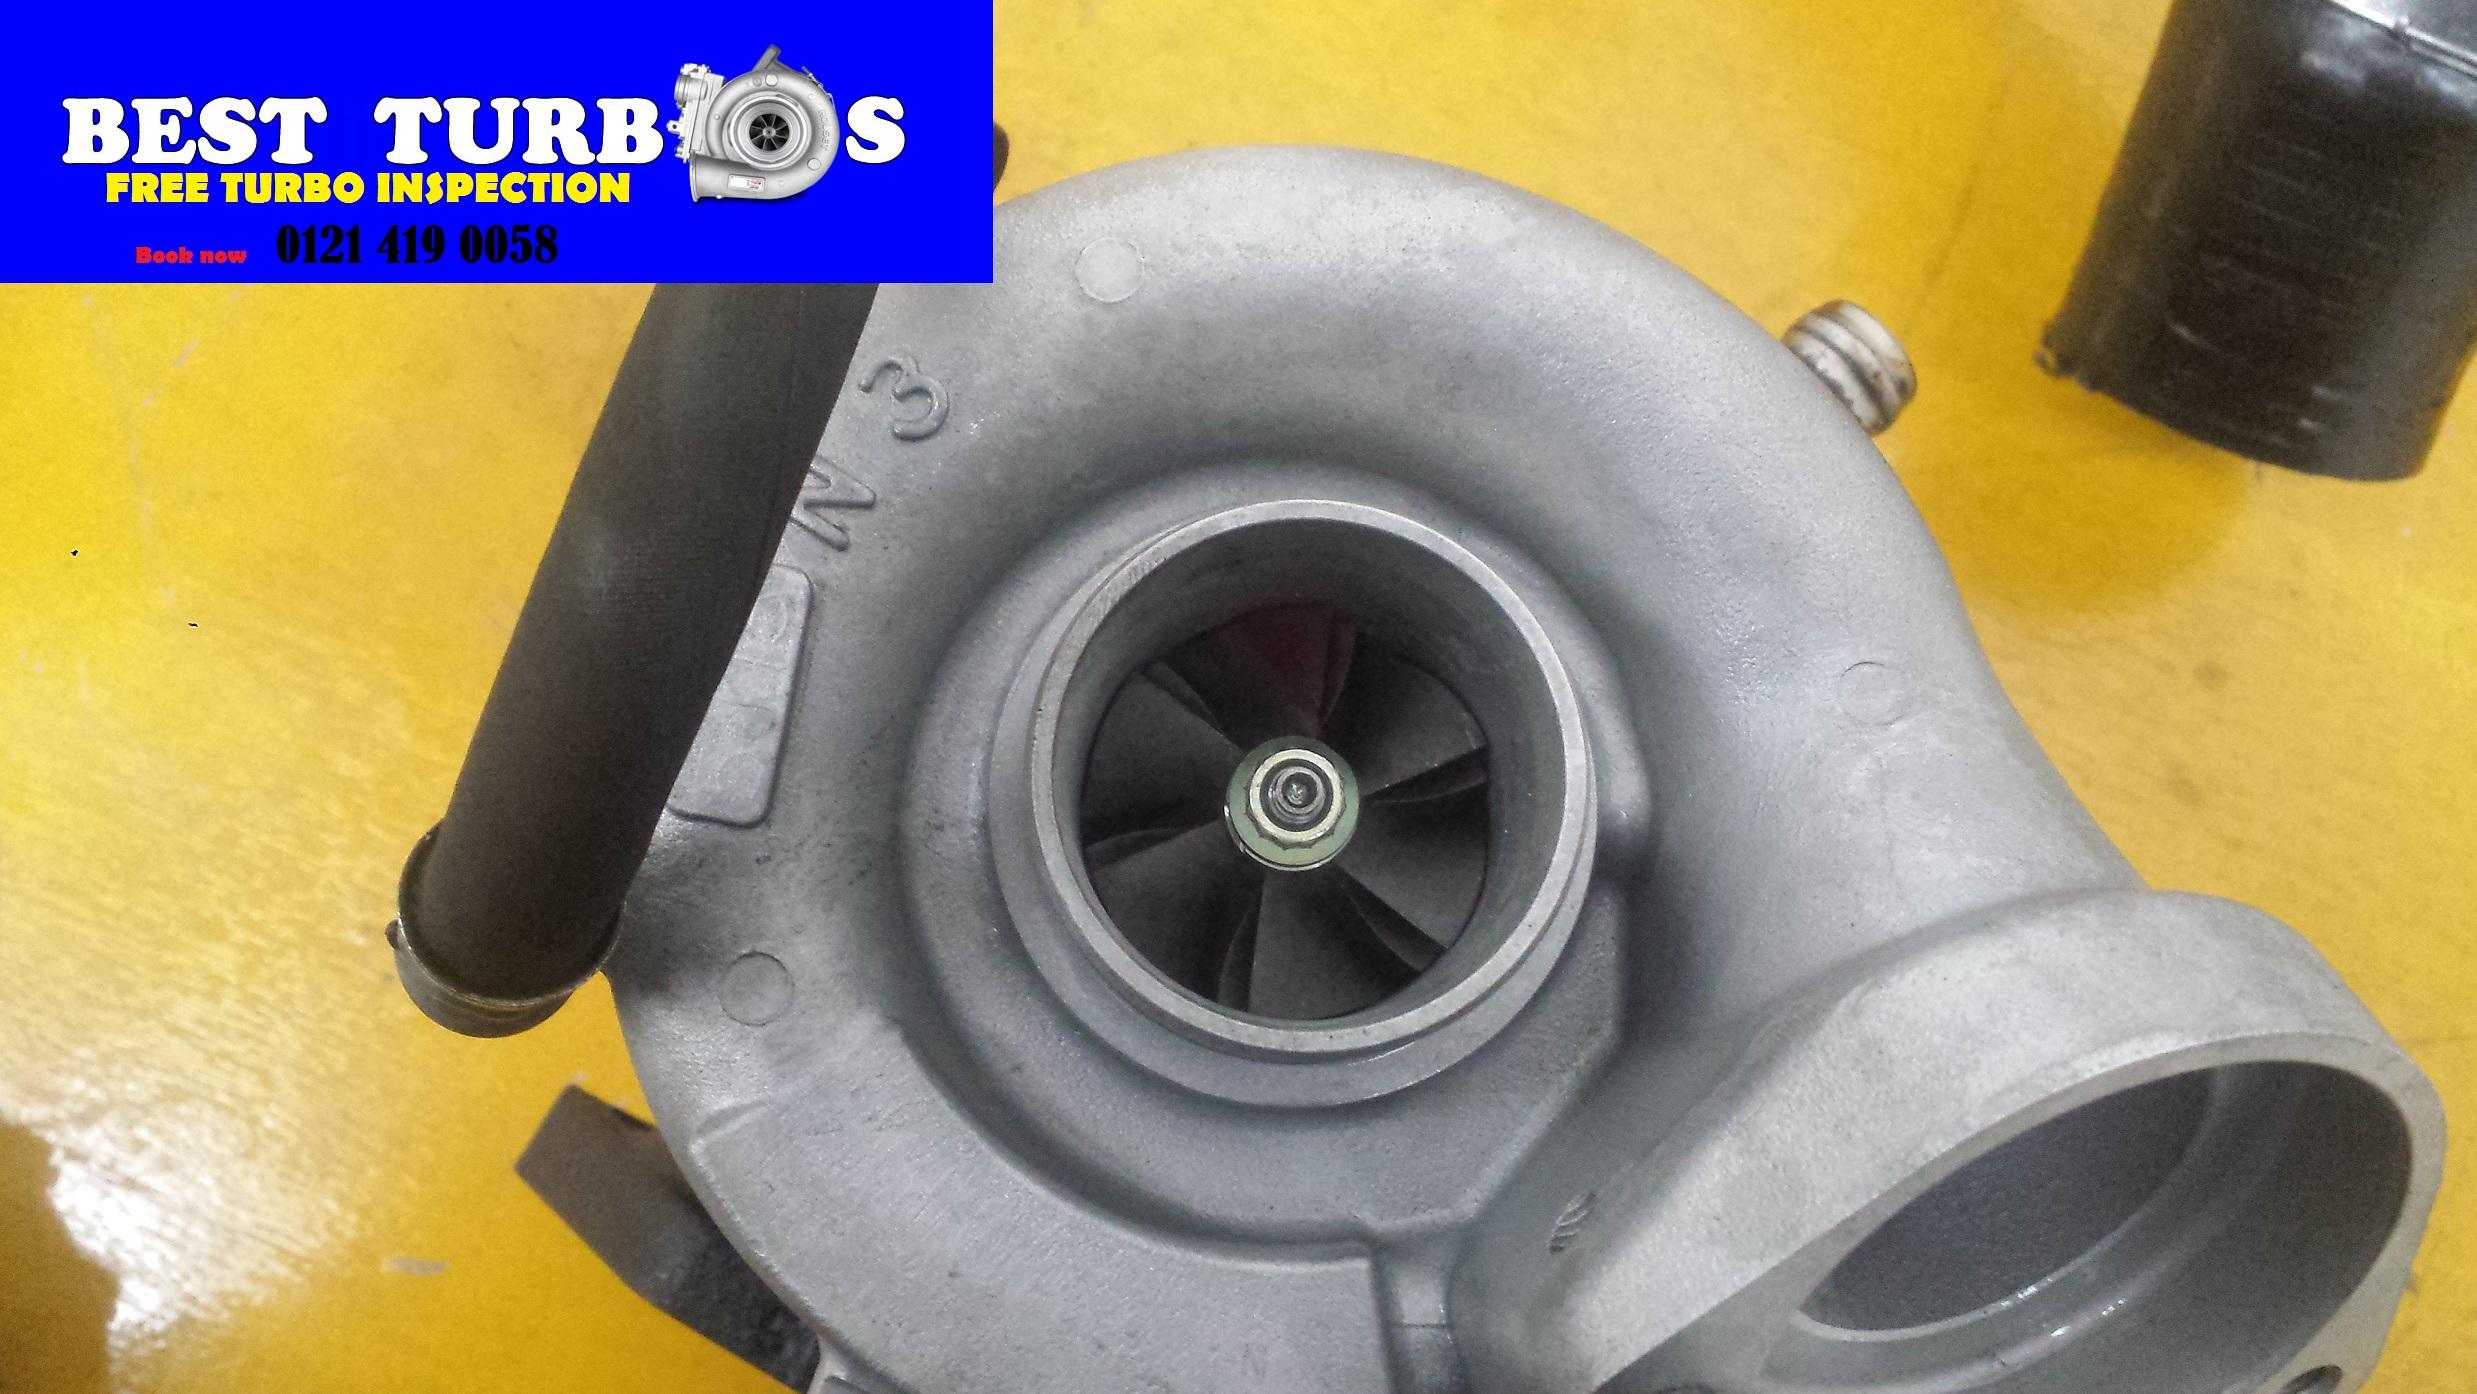 bmw 320d turbo reconditioning specialists best turbos birmingham west midlands wolverhampton walsall dudley erdington solihull sutton coldfield garret borg kkk GT1749V 717478 GT1749V 750431 GT2256V 454191 GT2256V 700935